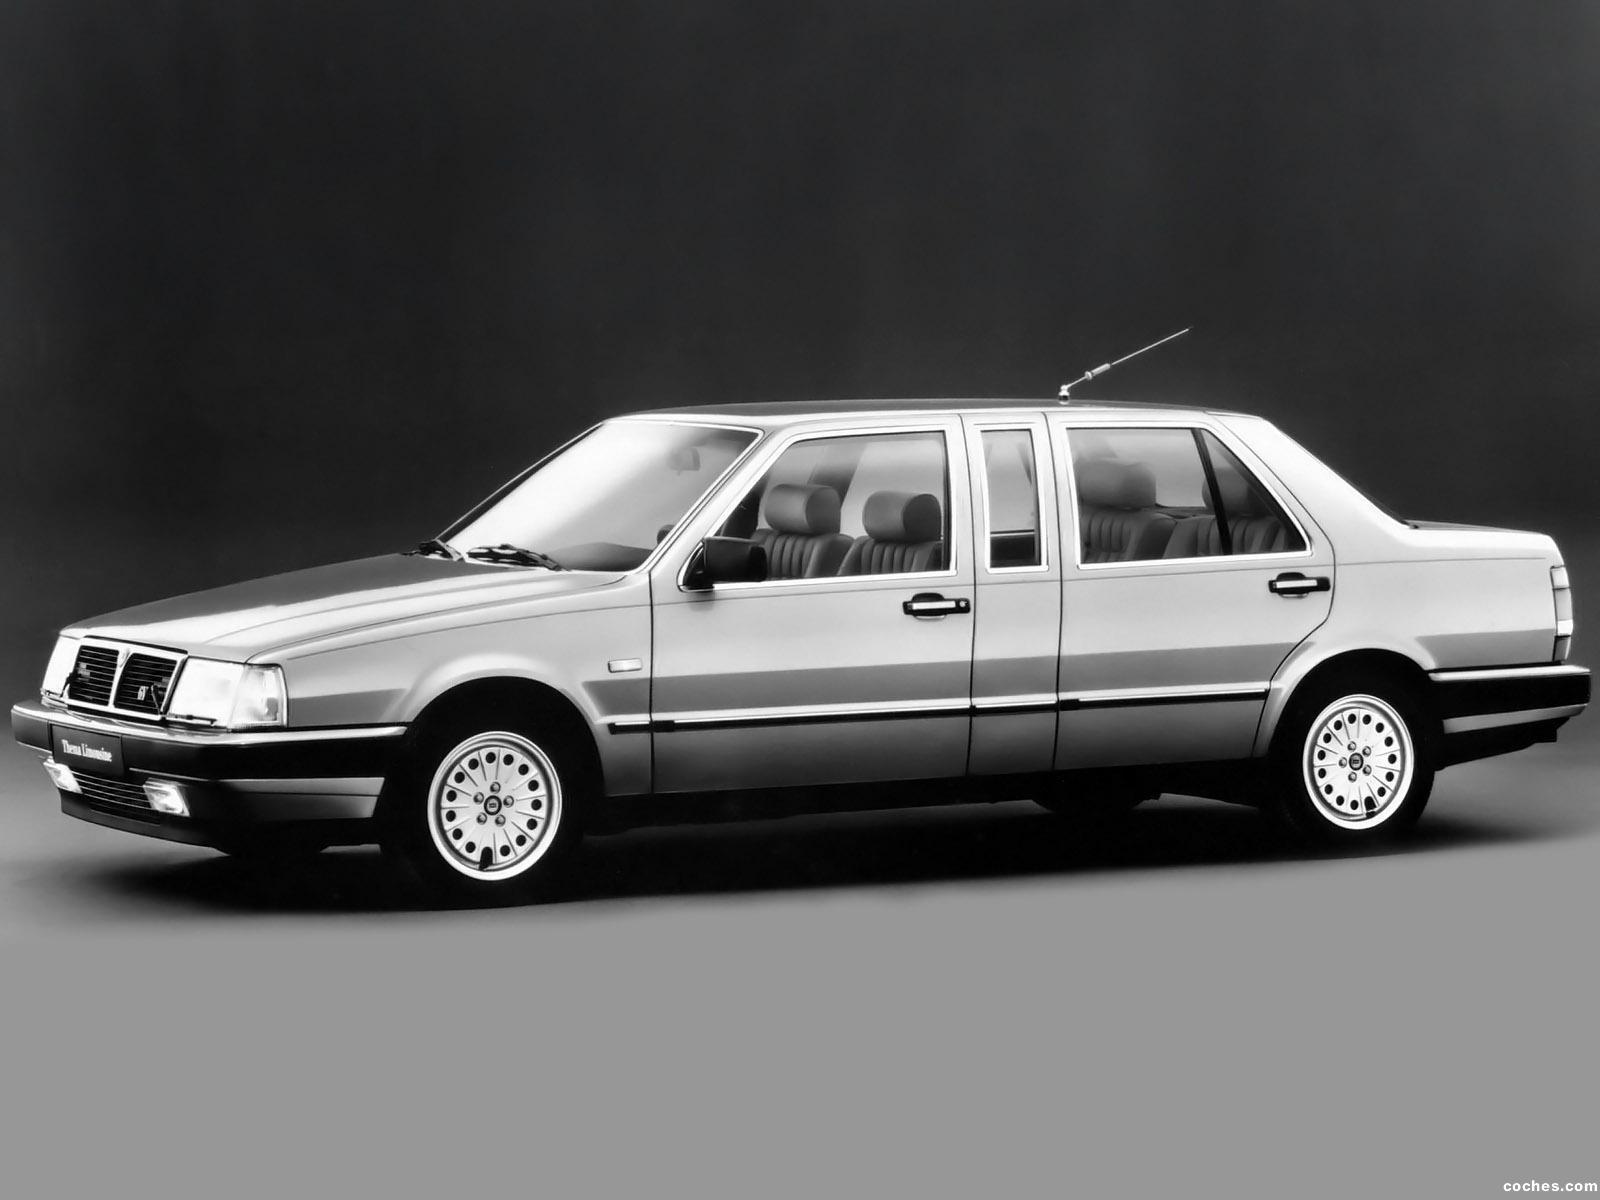 Foto 0 de Lancia Thema 2.8 V6 Limousine 1984